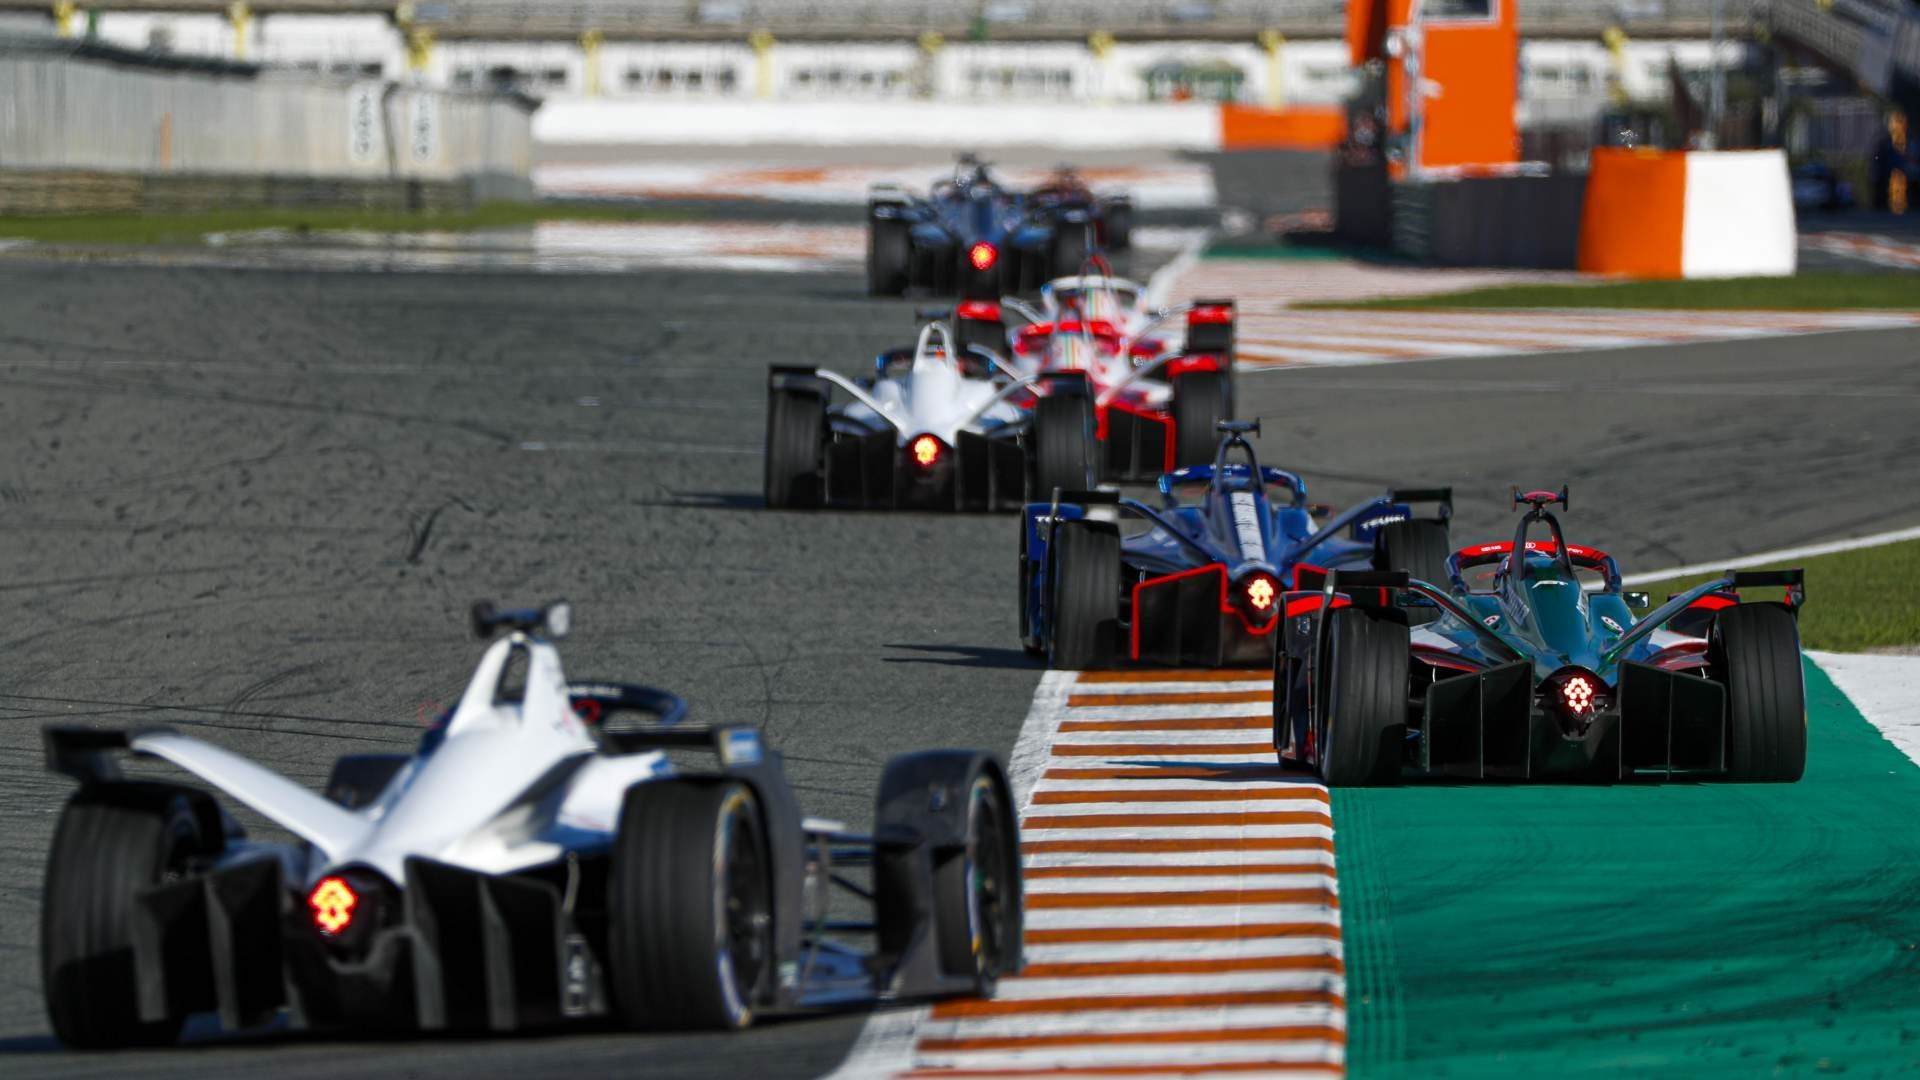 Formula E Eprix Valencia 2021: Orari Tv E Risultati - Motorbox for Formula E 2021 On Tv